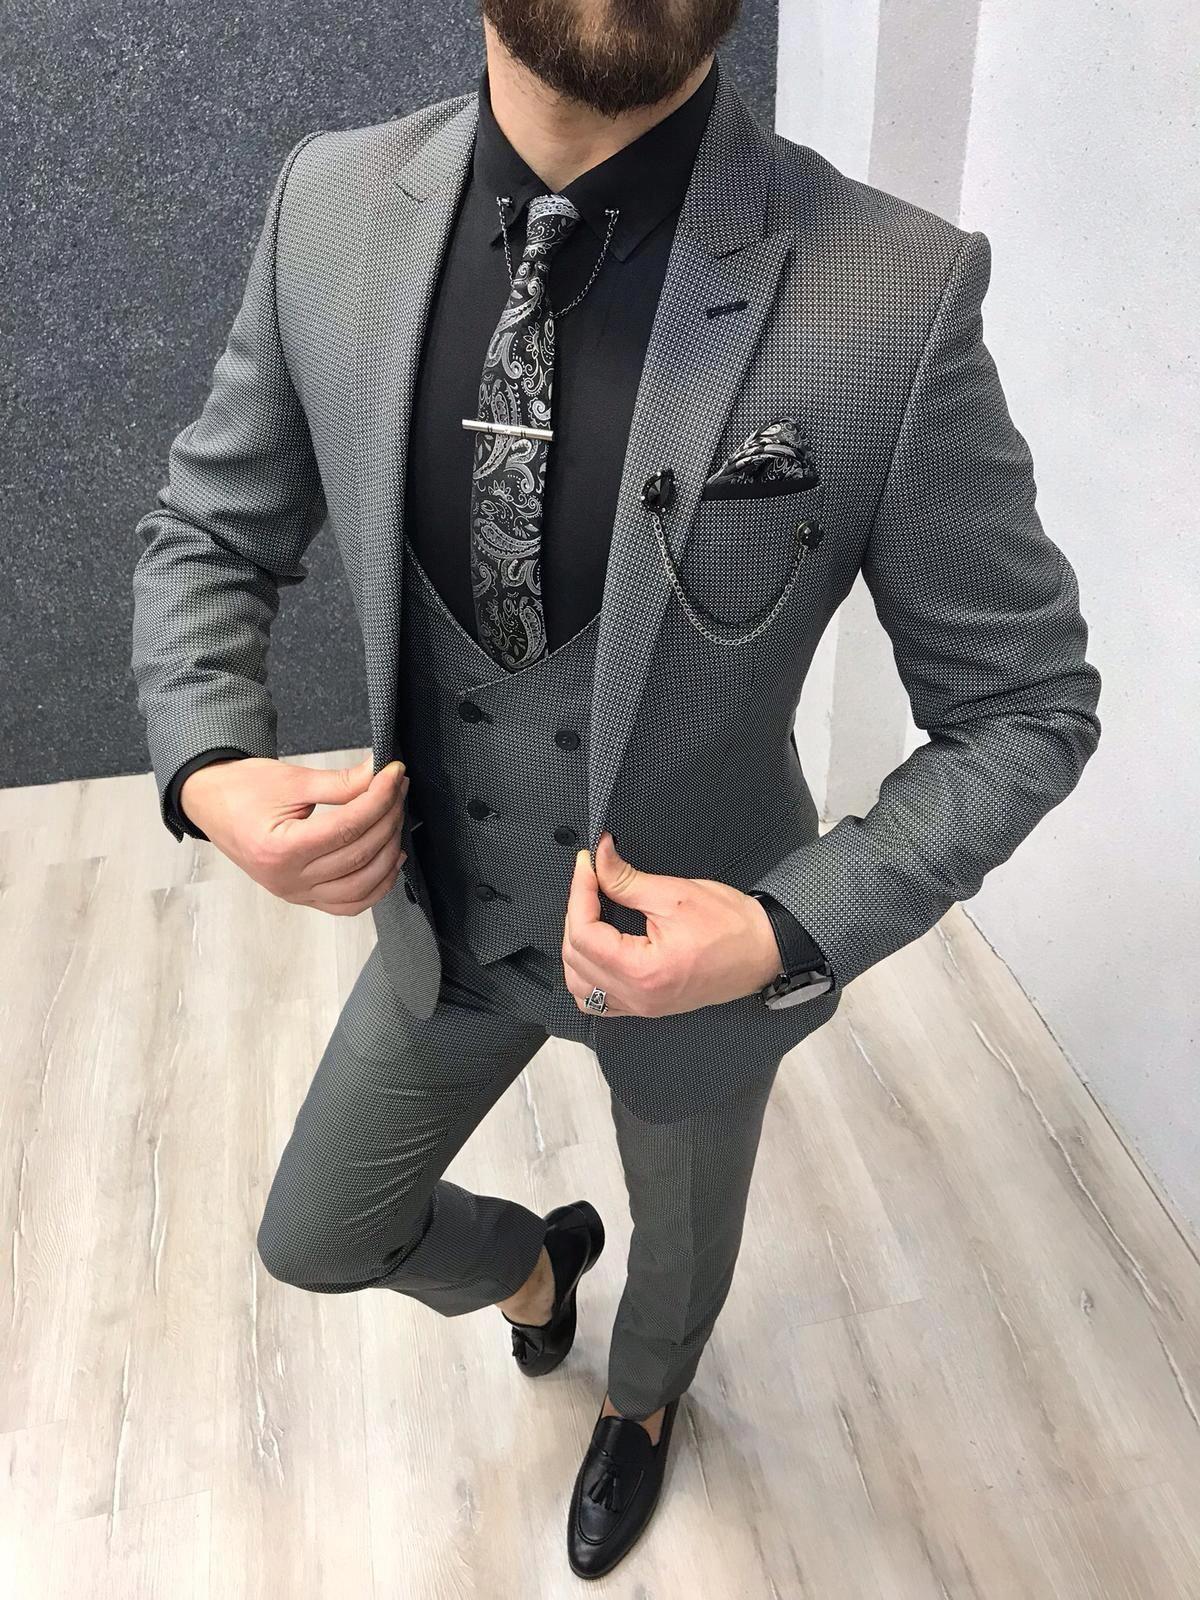 79403d0b Pin by prakash zodiac on zodiac suit in 2019 | Suits, Mens fashion ...